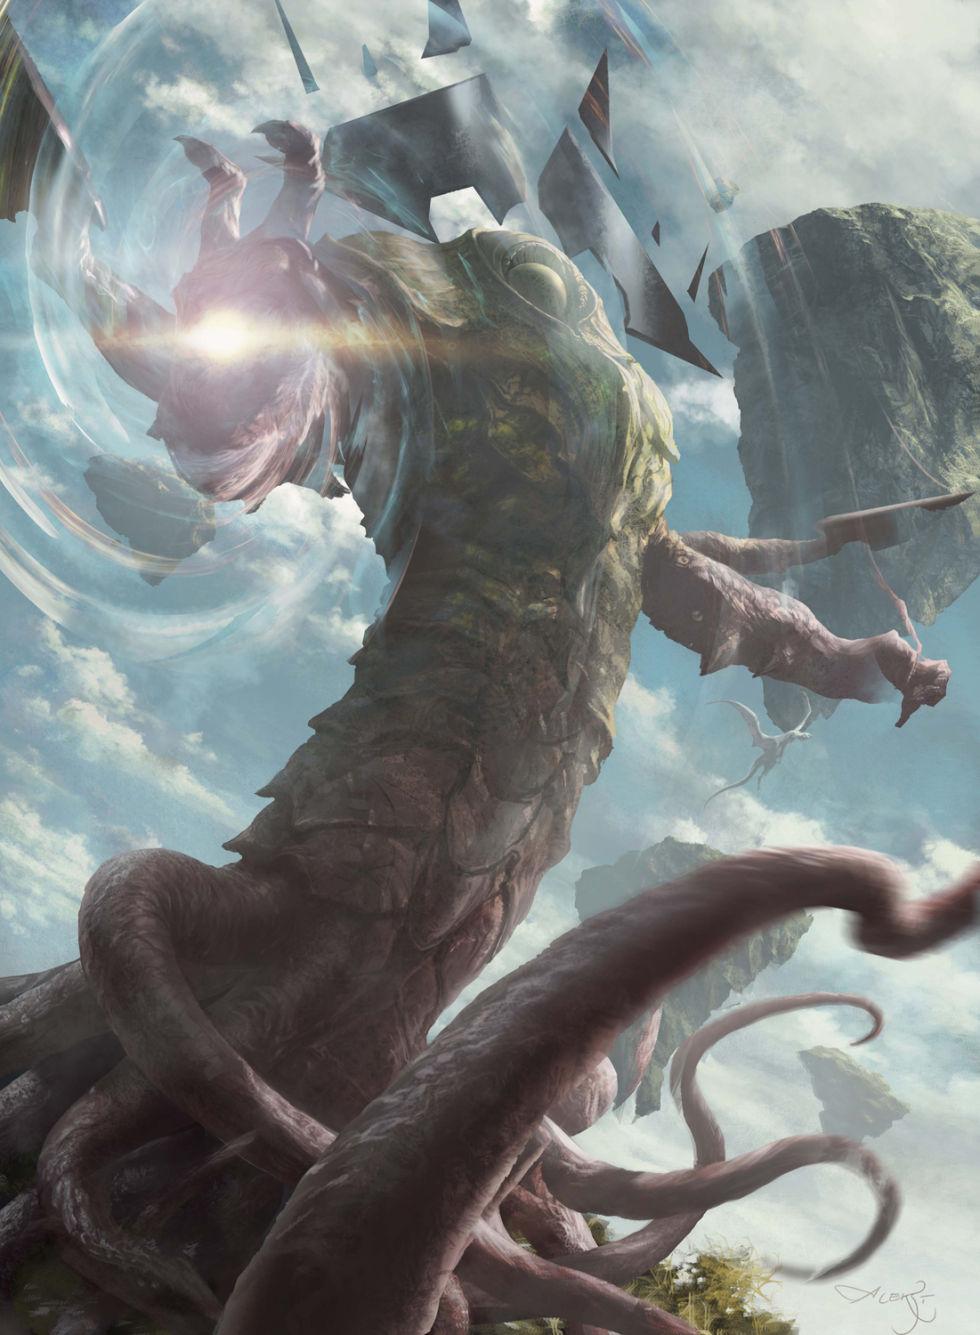 Kozilek, the Big Bad of this <em>Magic</em> expansion.